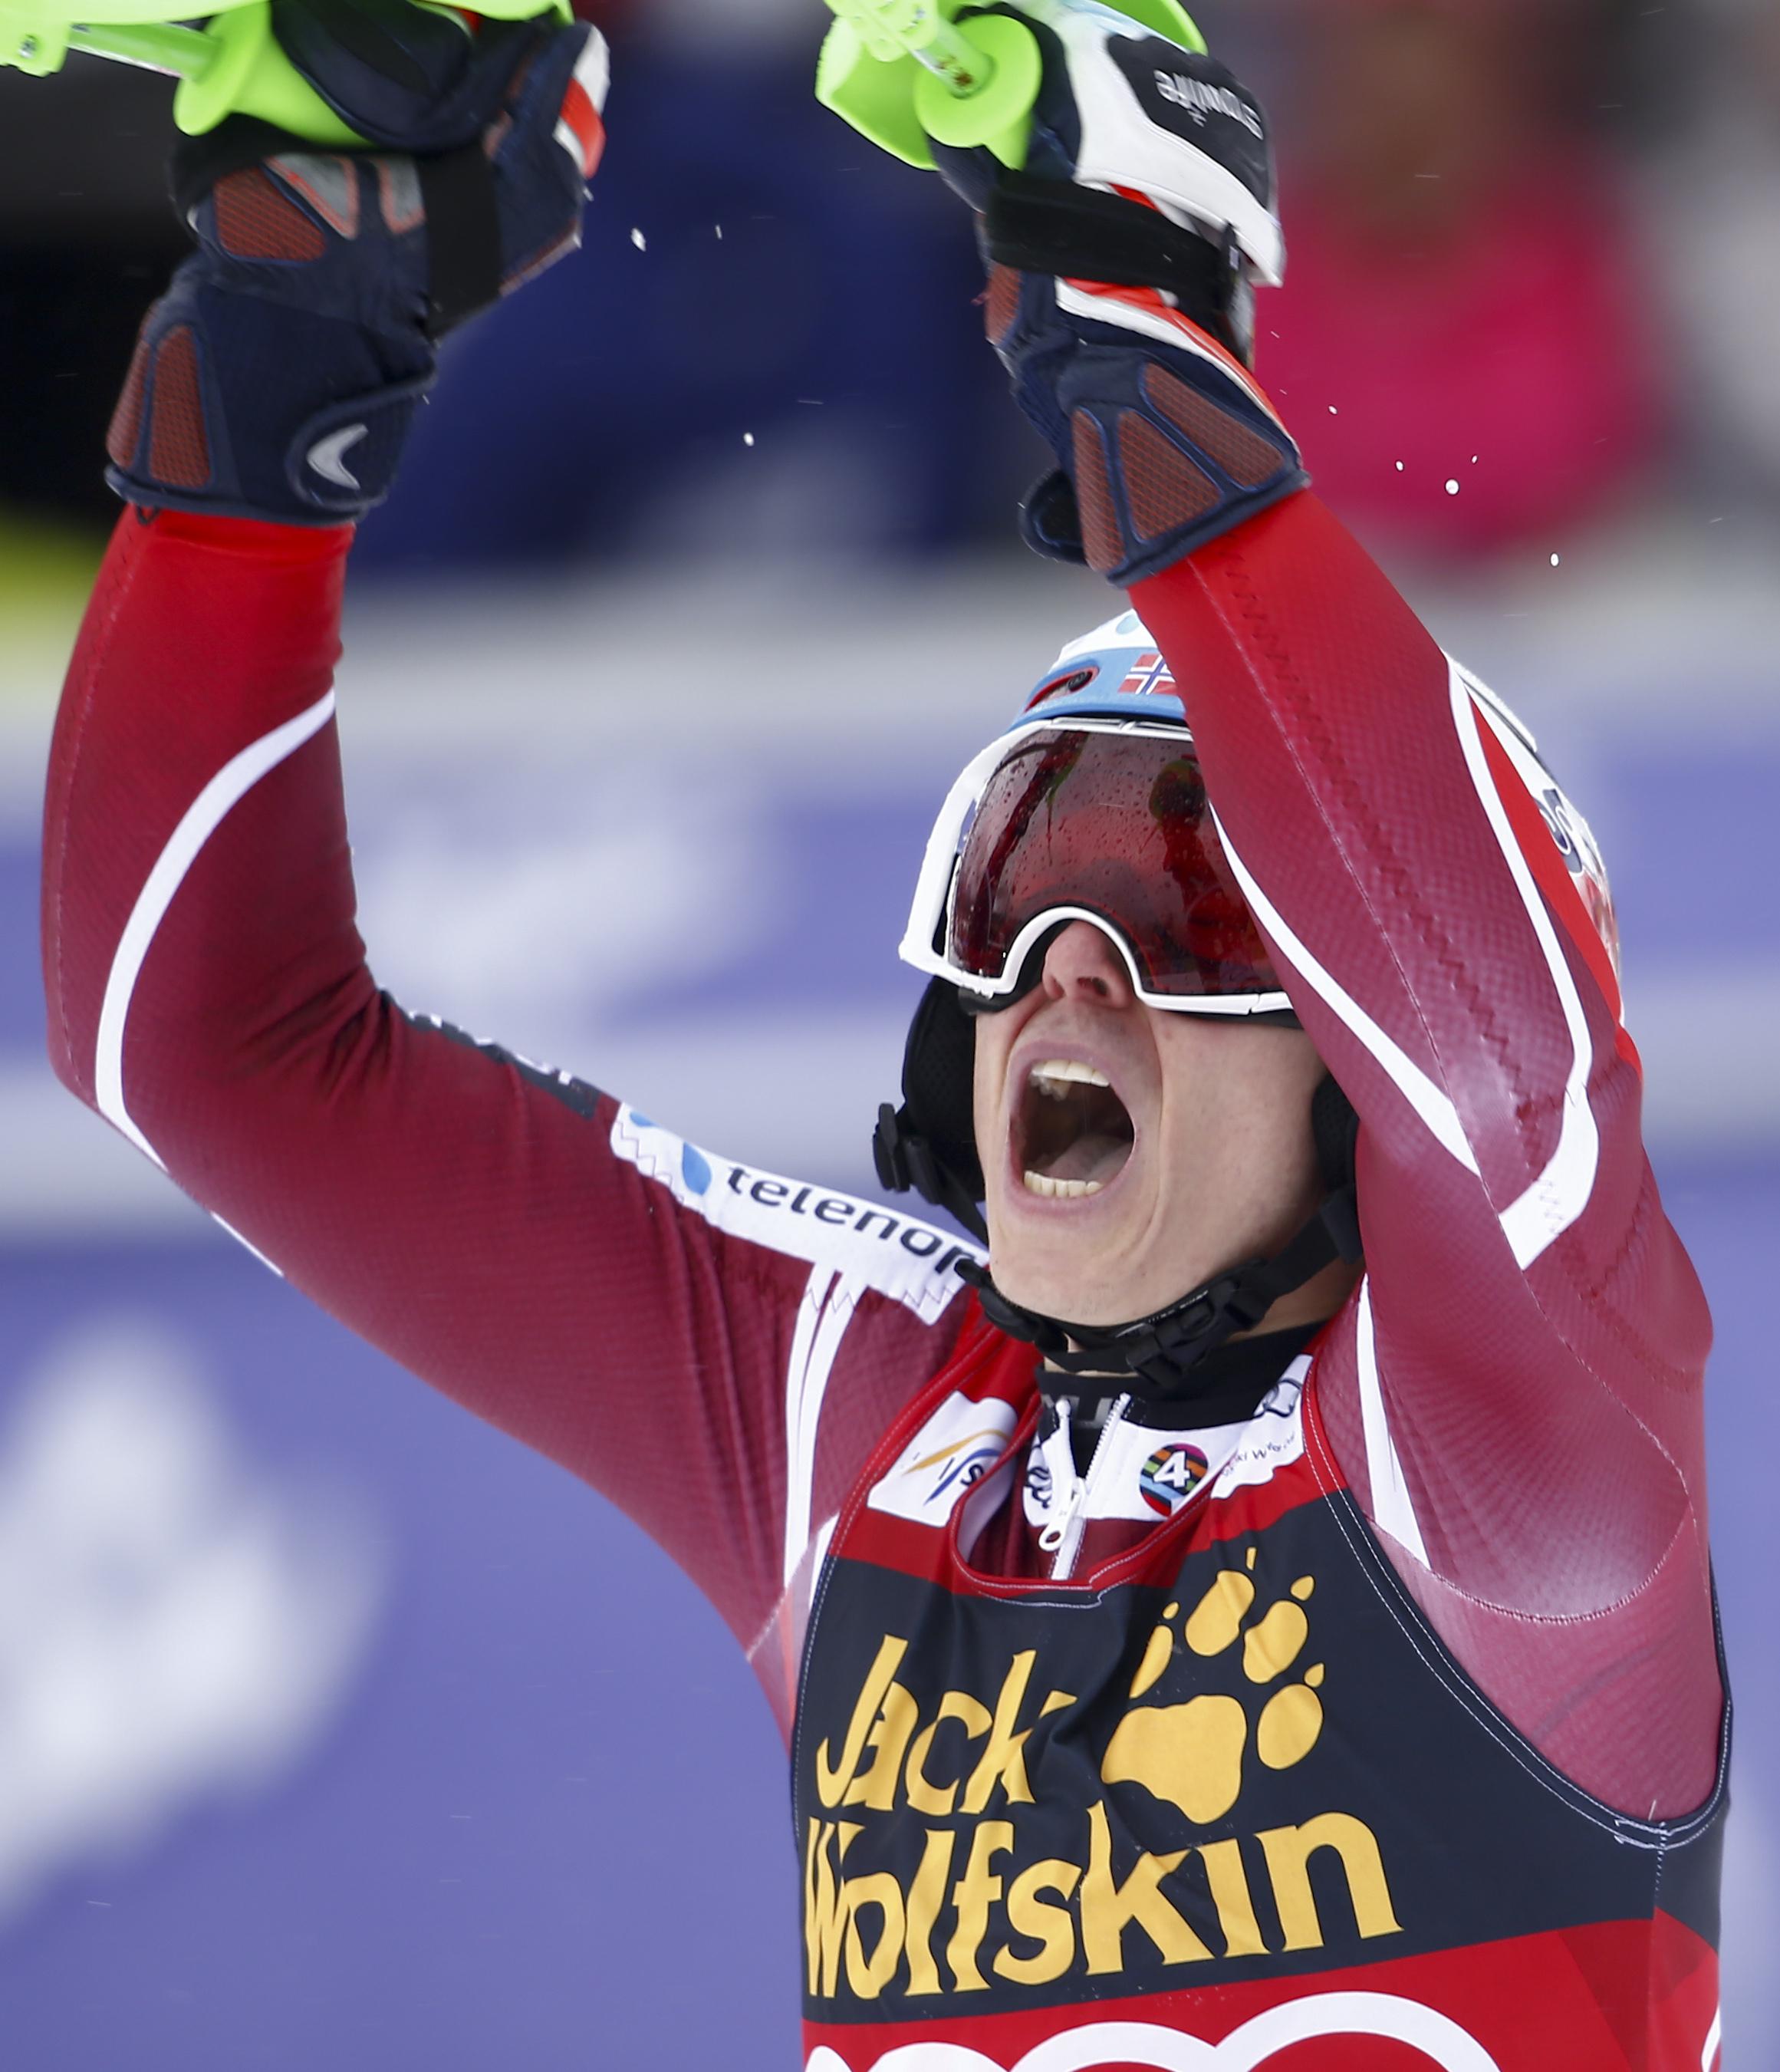 slovenia_alpine_skiing_world_cup-4ab0097_r5551.jpeg